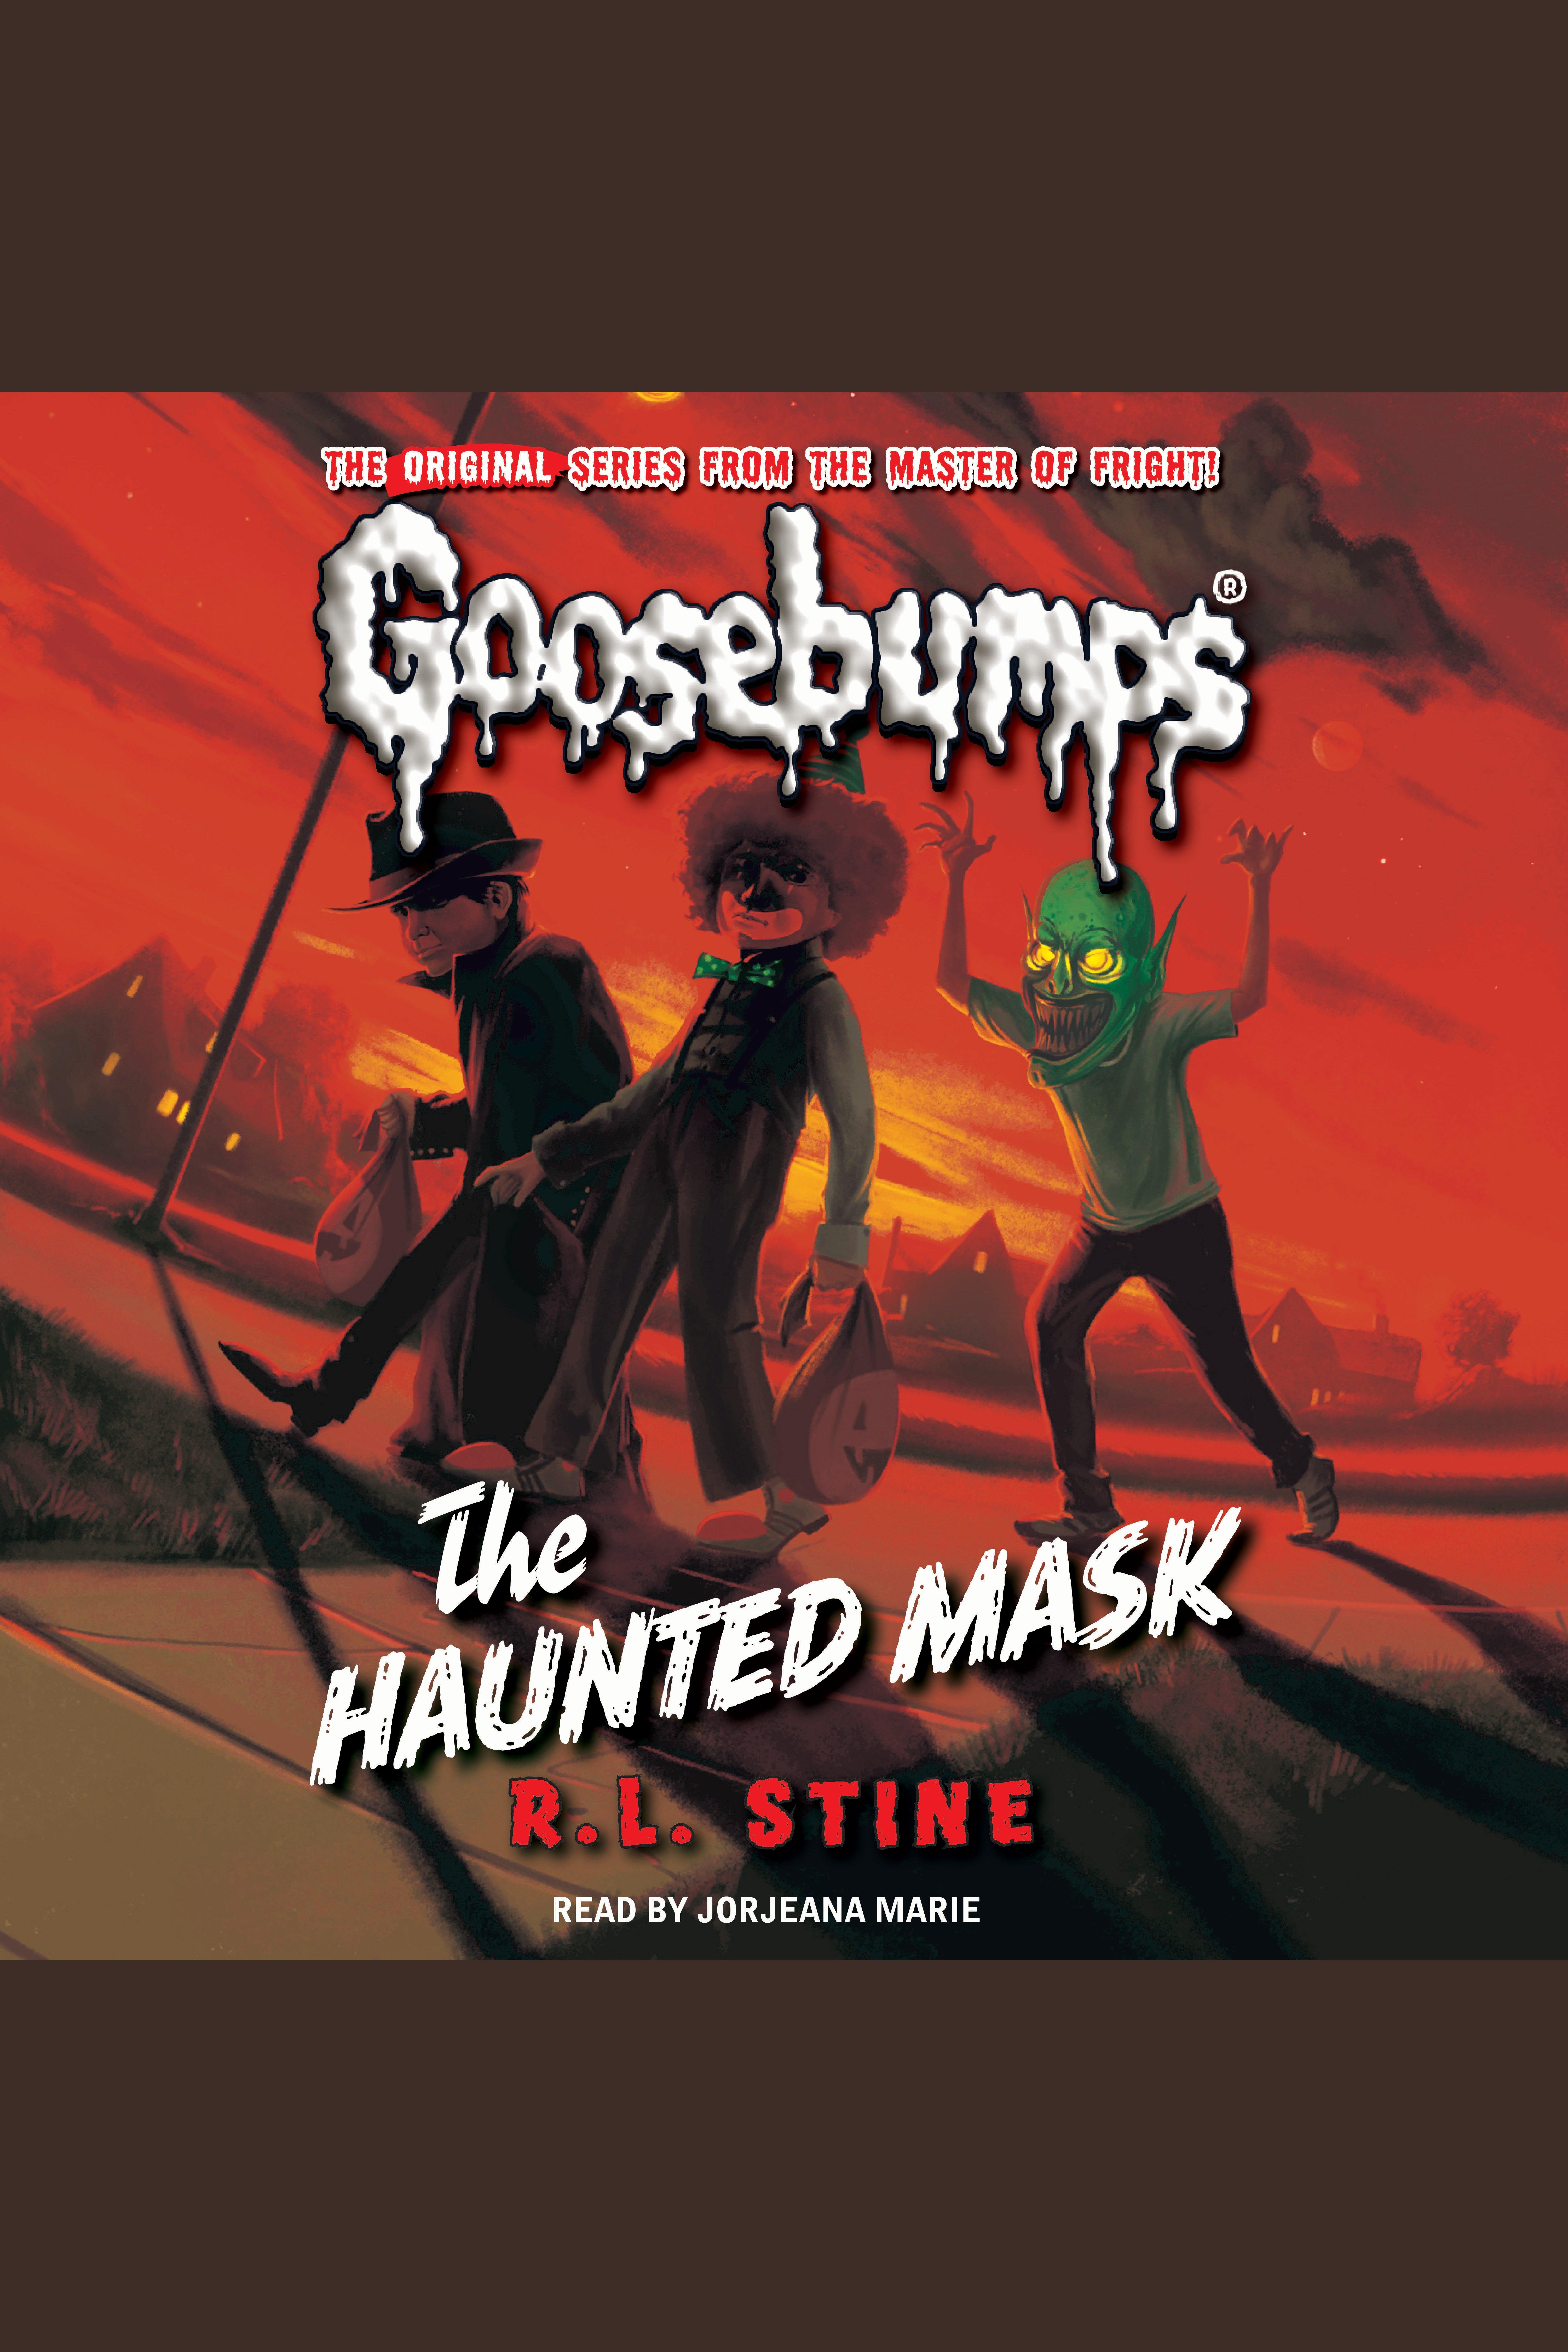 Classic Goosebumps - The Haunted Mask The Haunted Mask